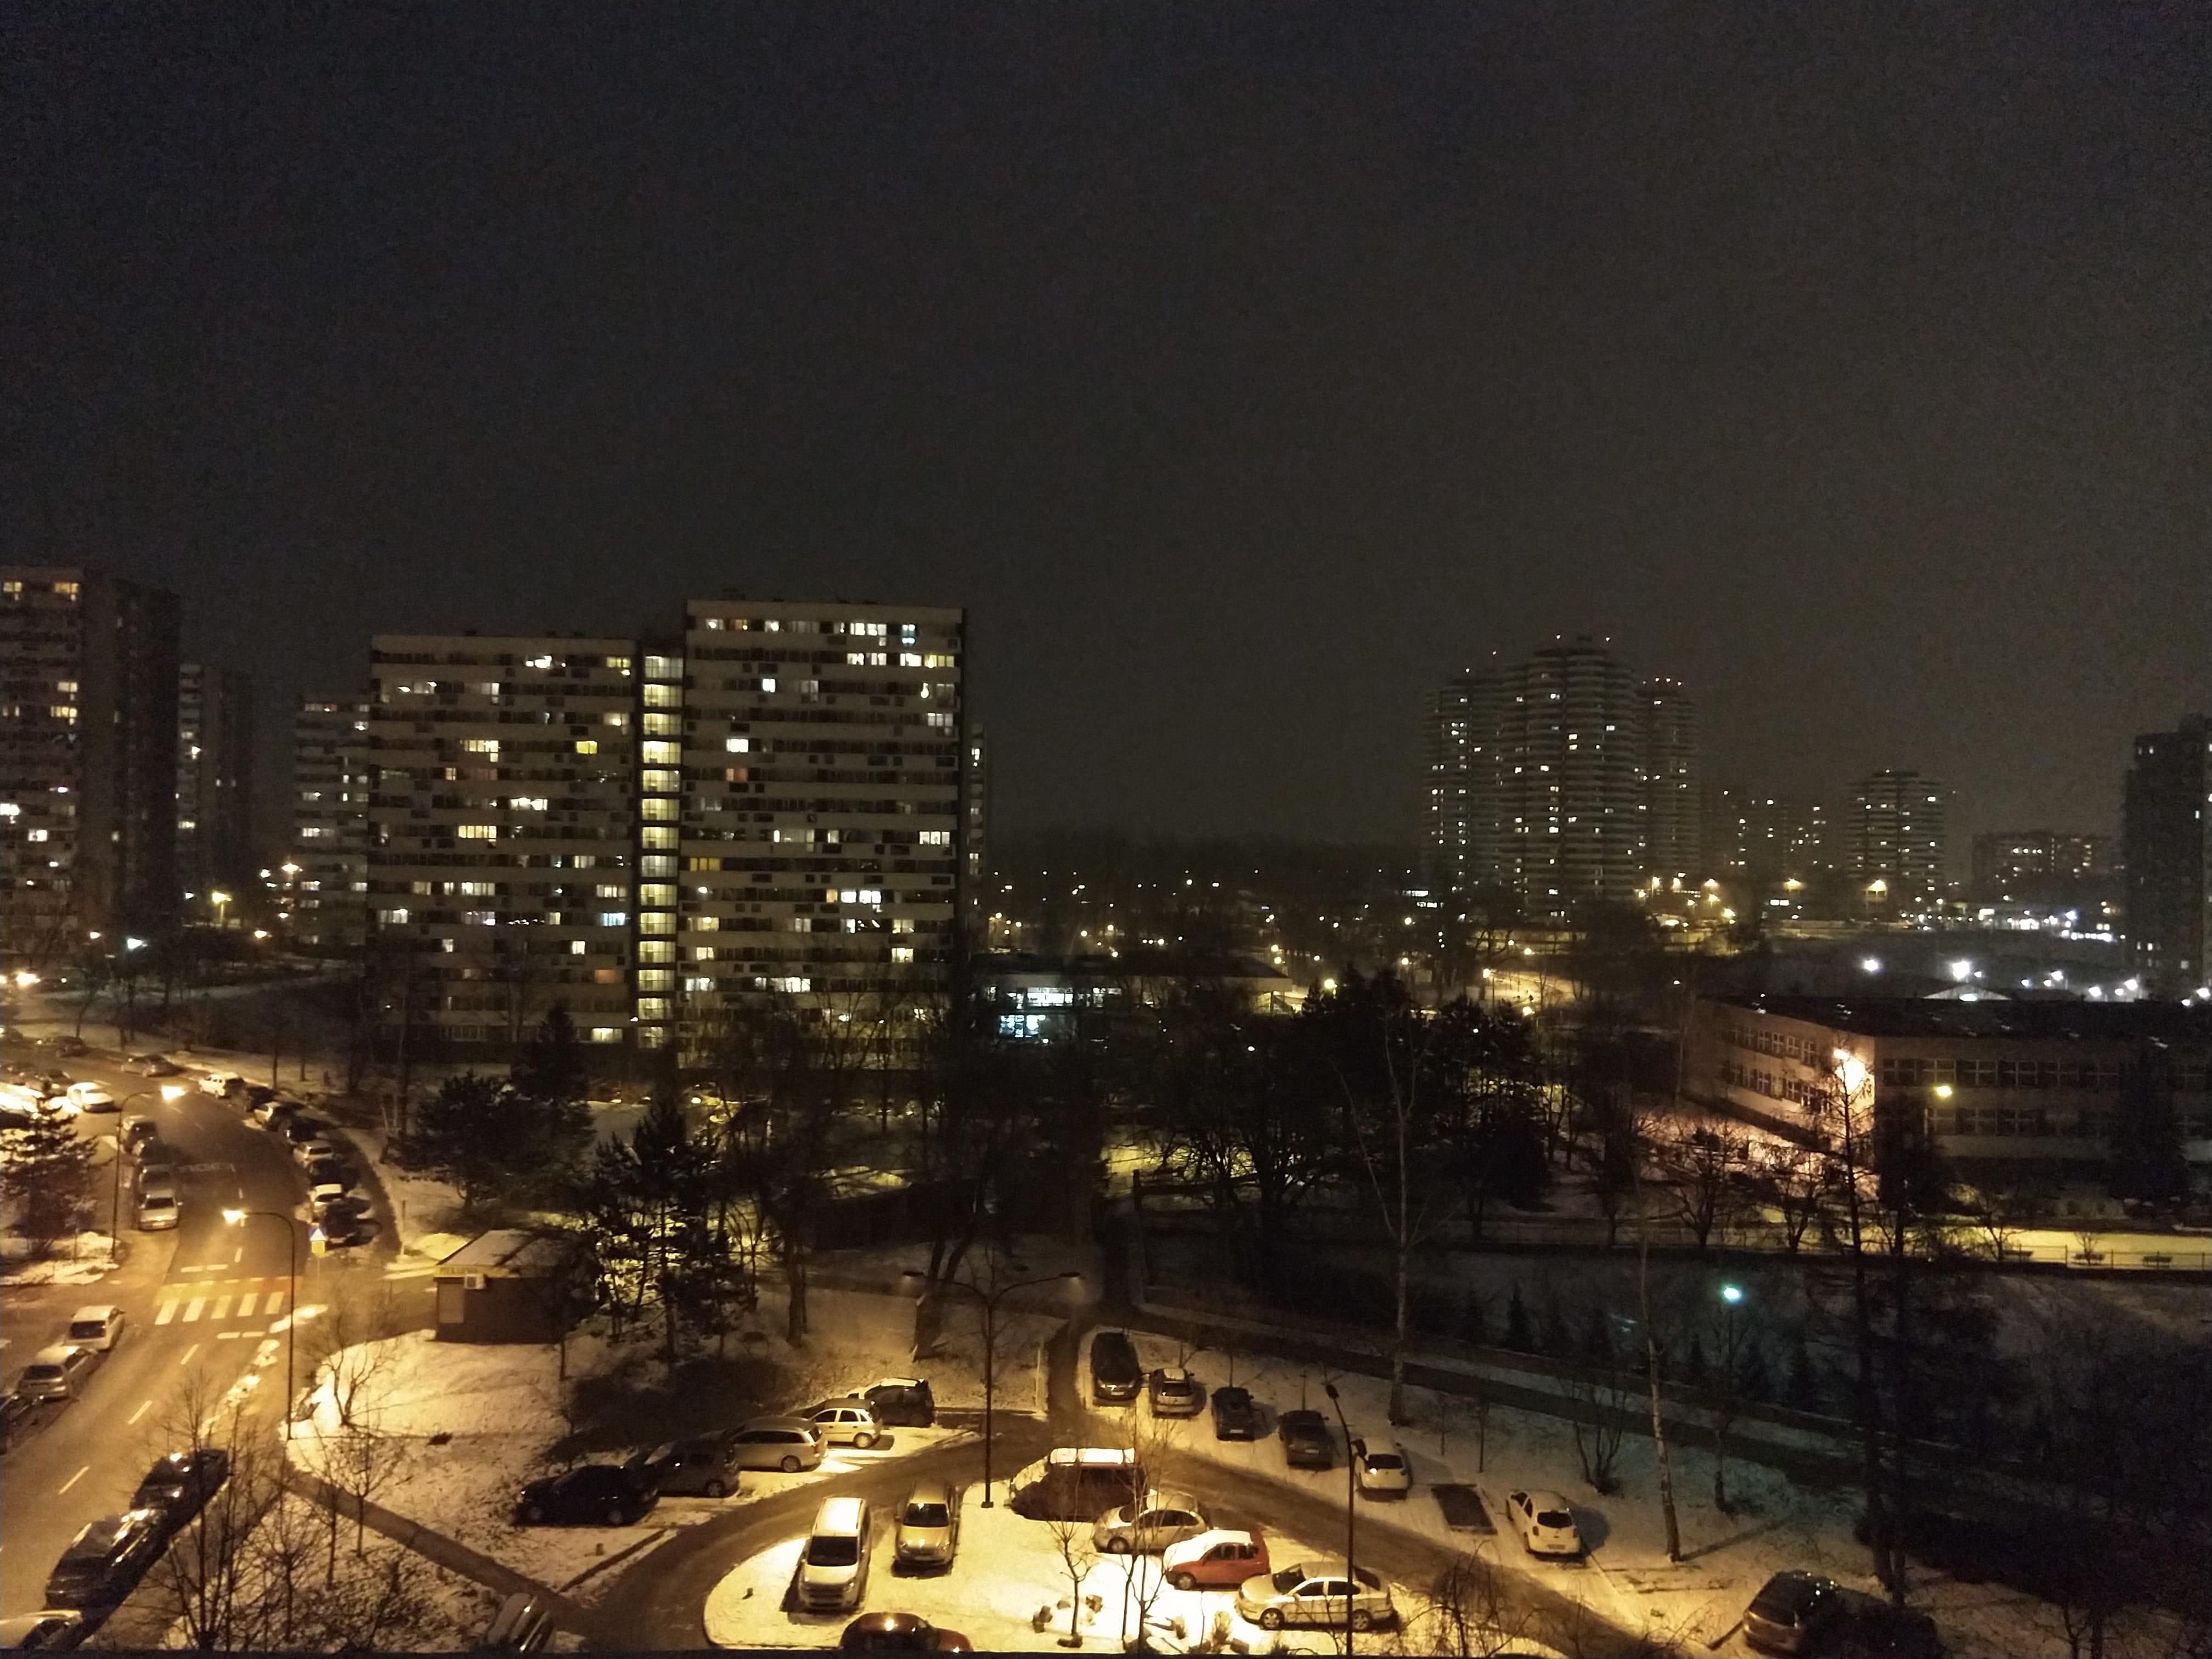 Zdjęcia nocne - Motorola Moto X4